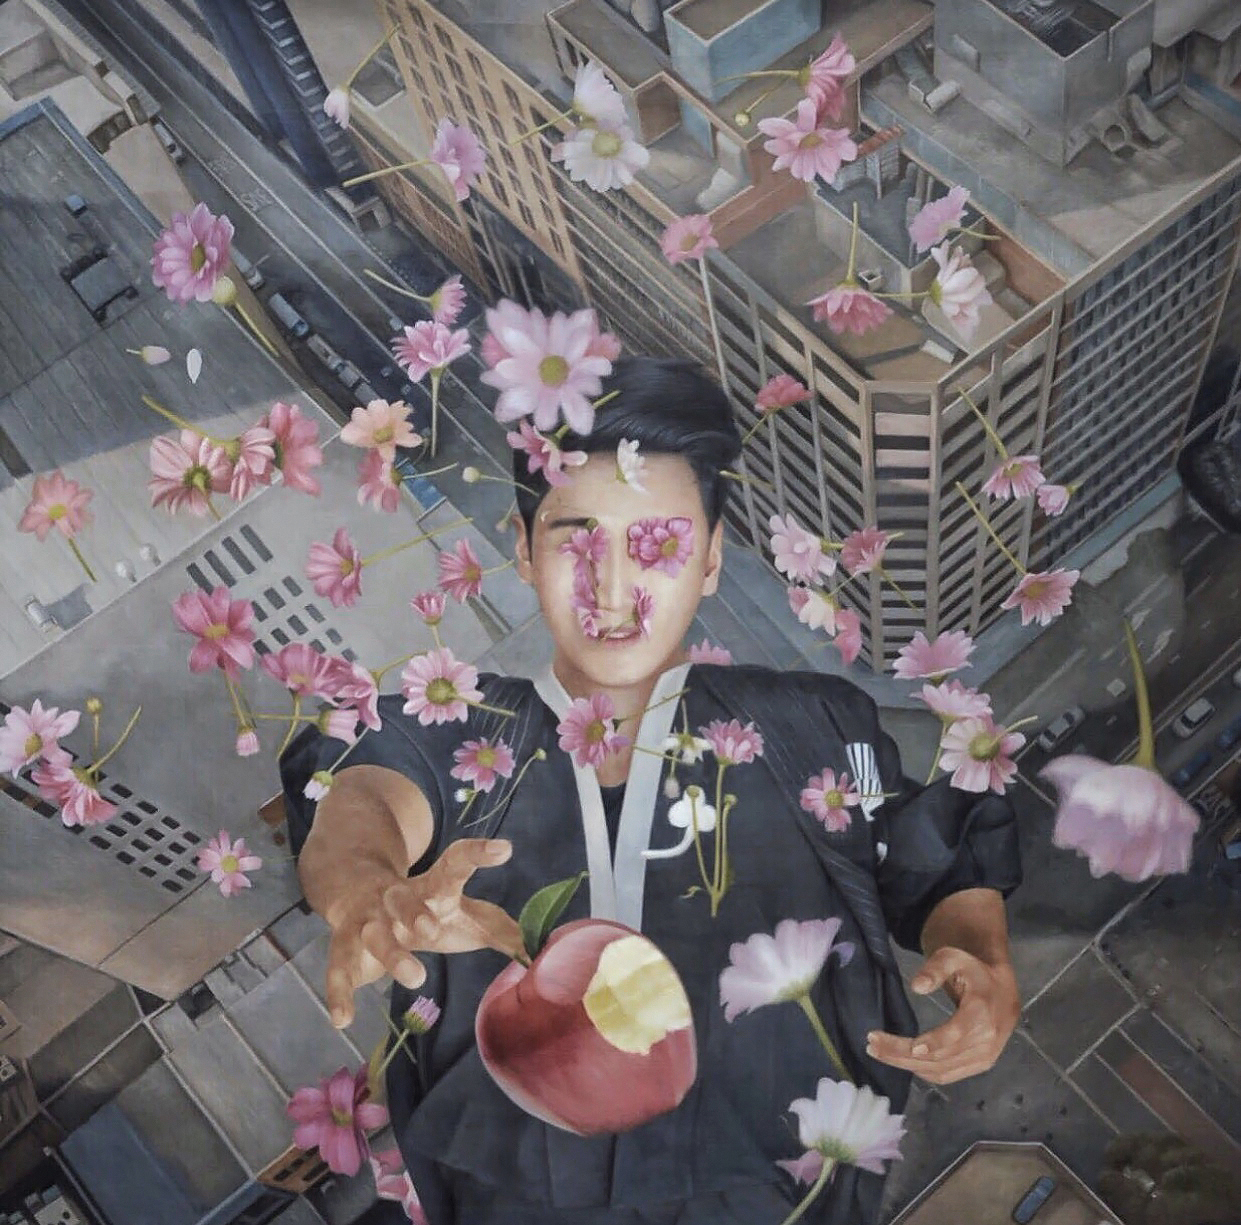 Aiman Hakim Artist Singapore Utarit koons Oil Painting Snow white apple